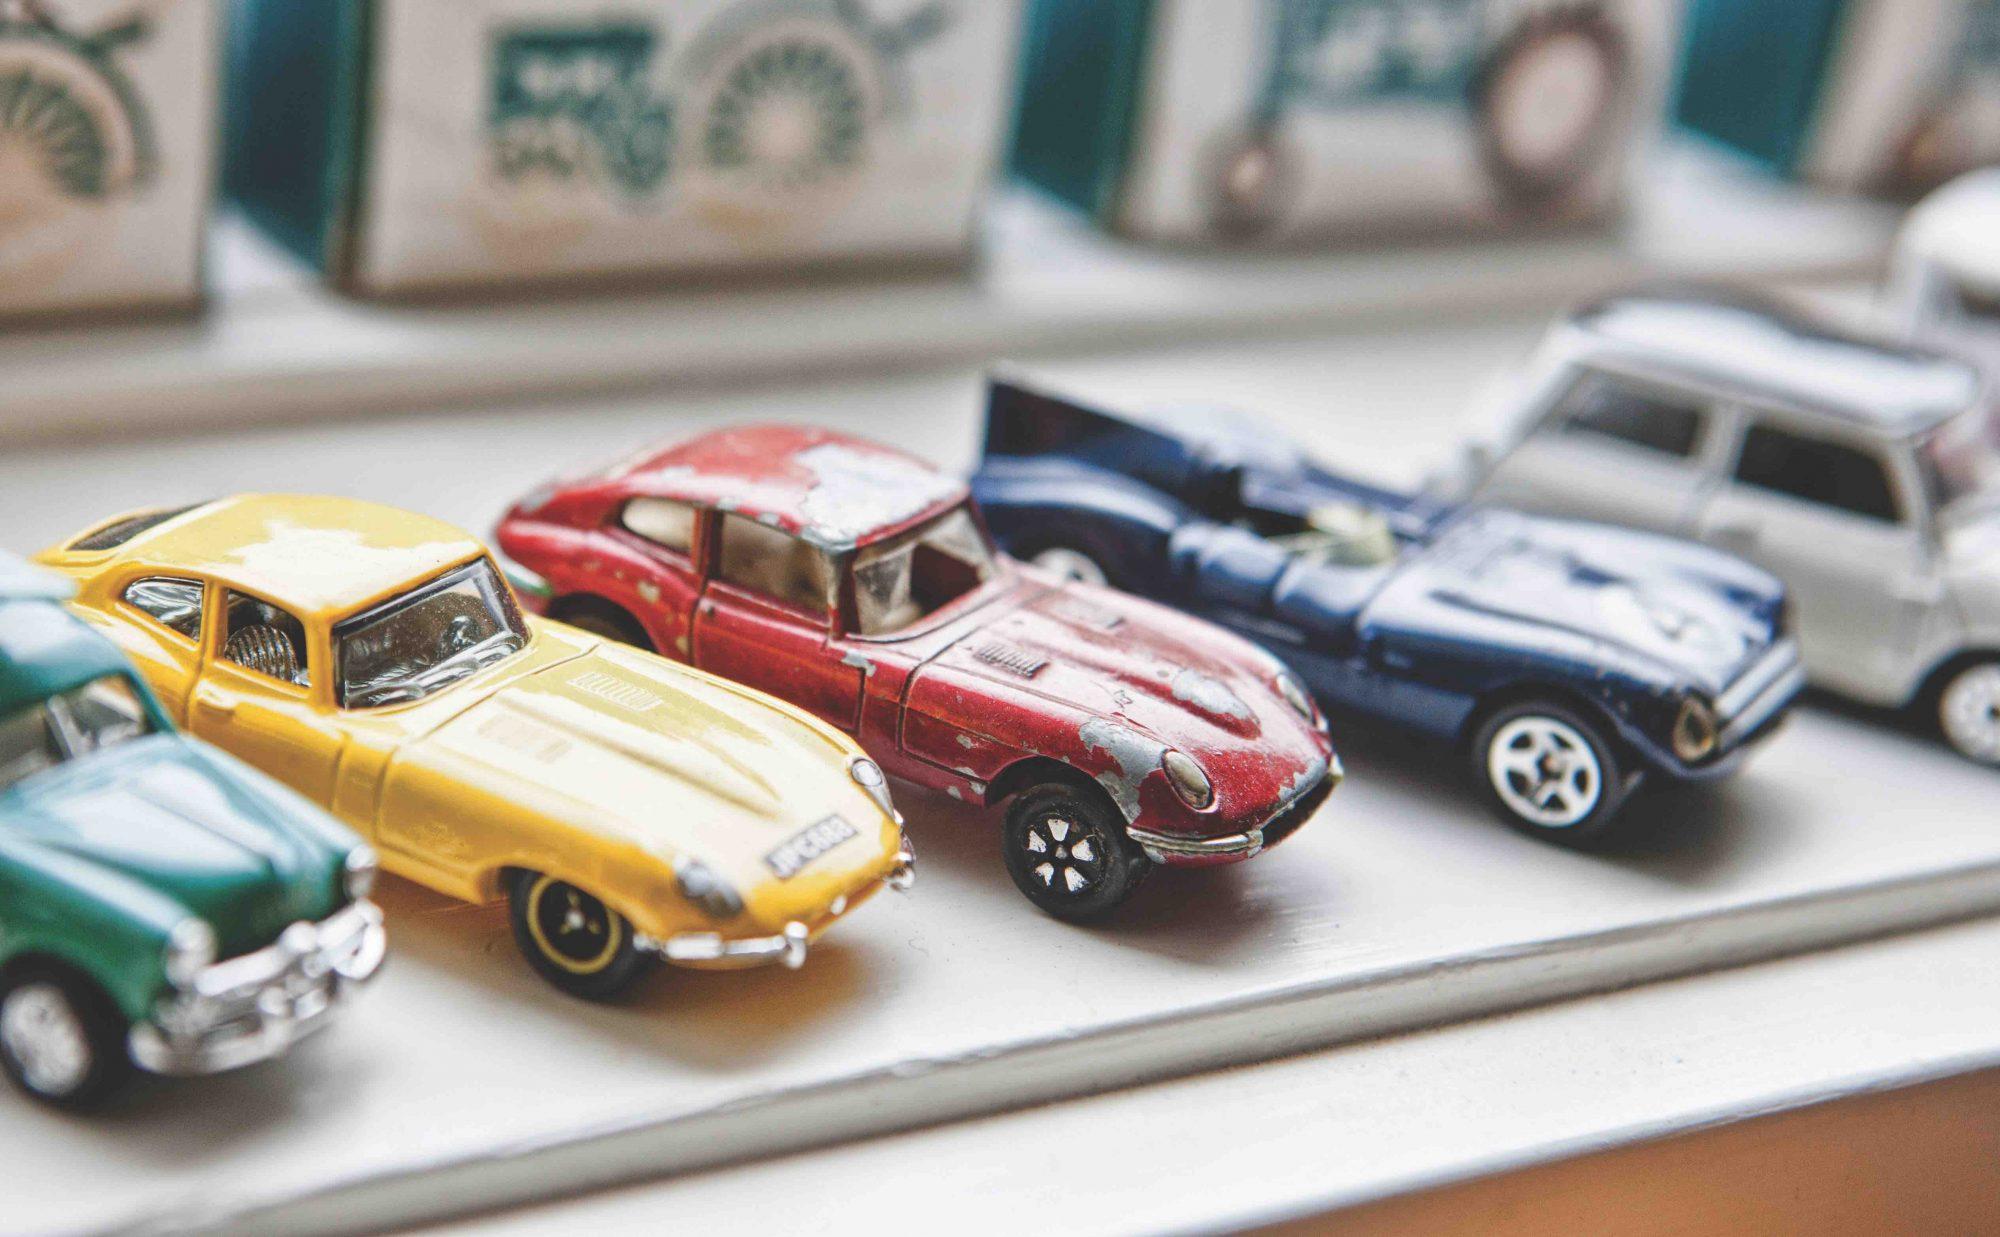 Todd Mahal model cars